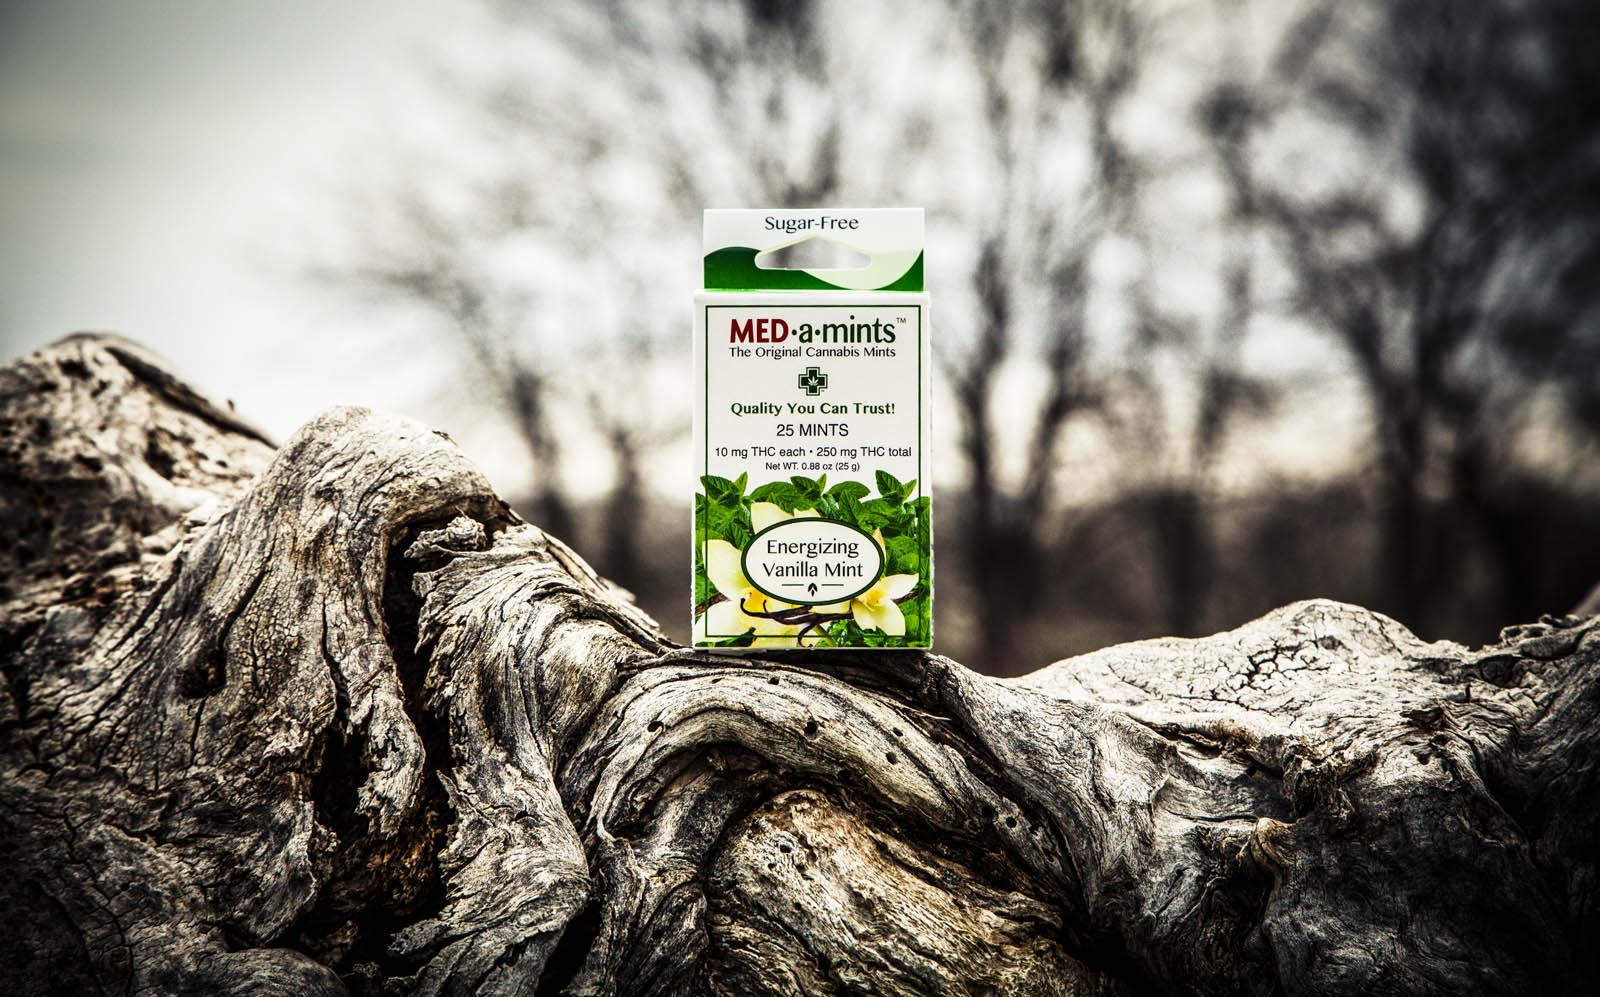 medamints-potent-thc-cannabis-marijuana-mints-026